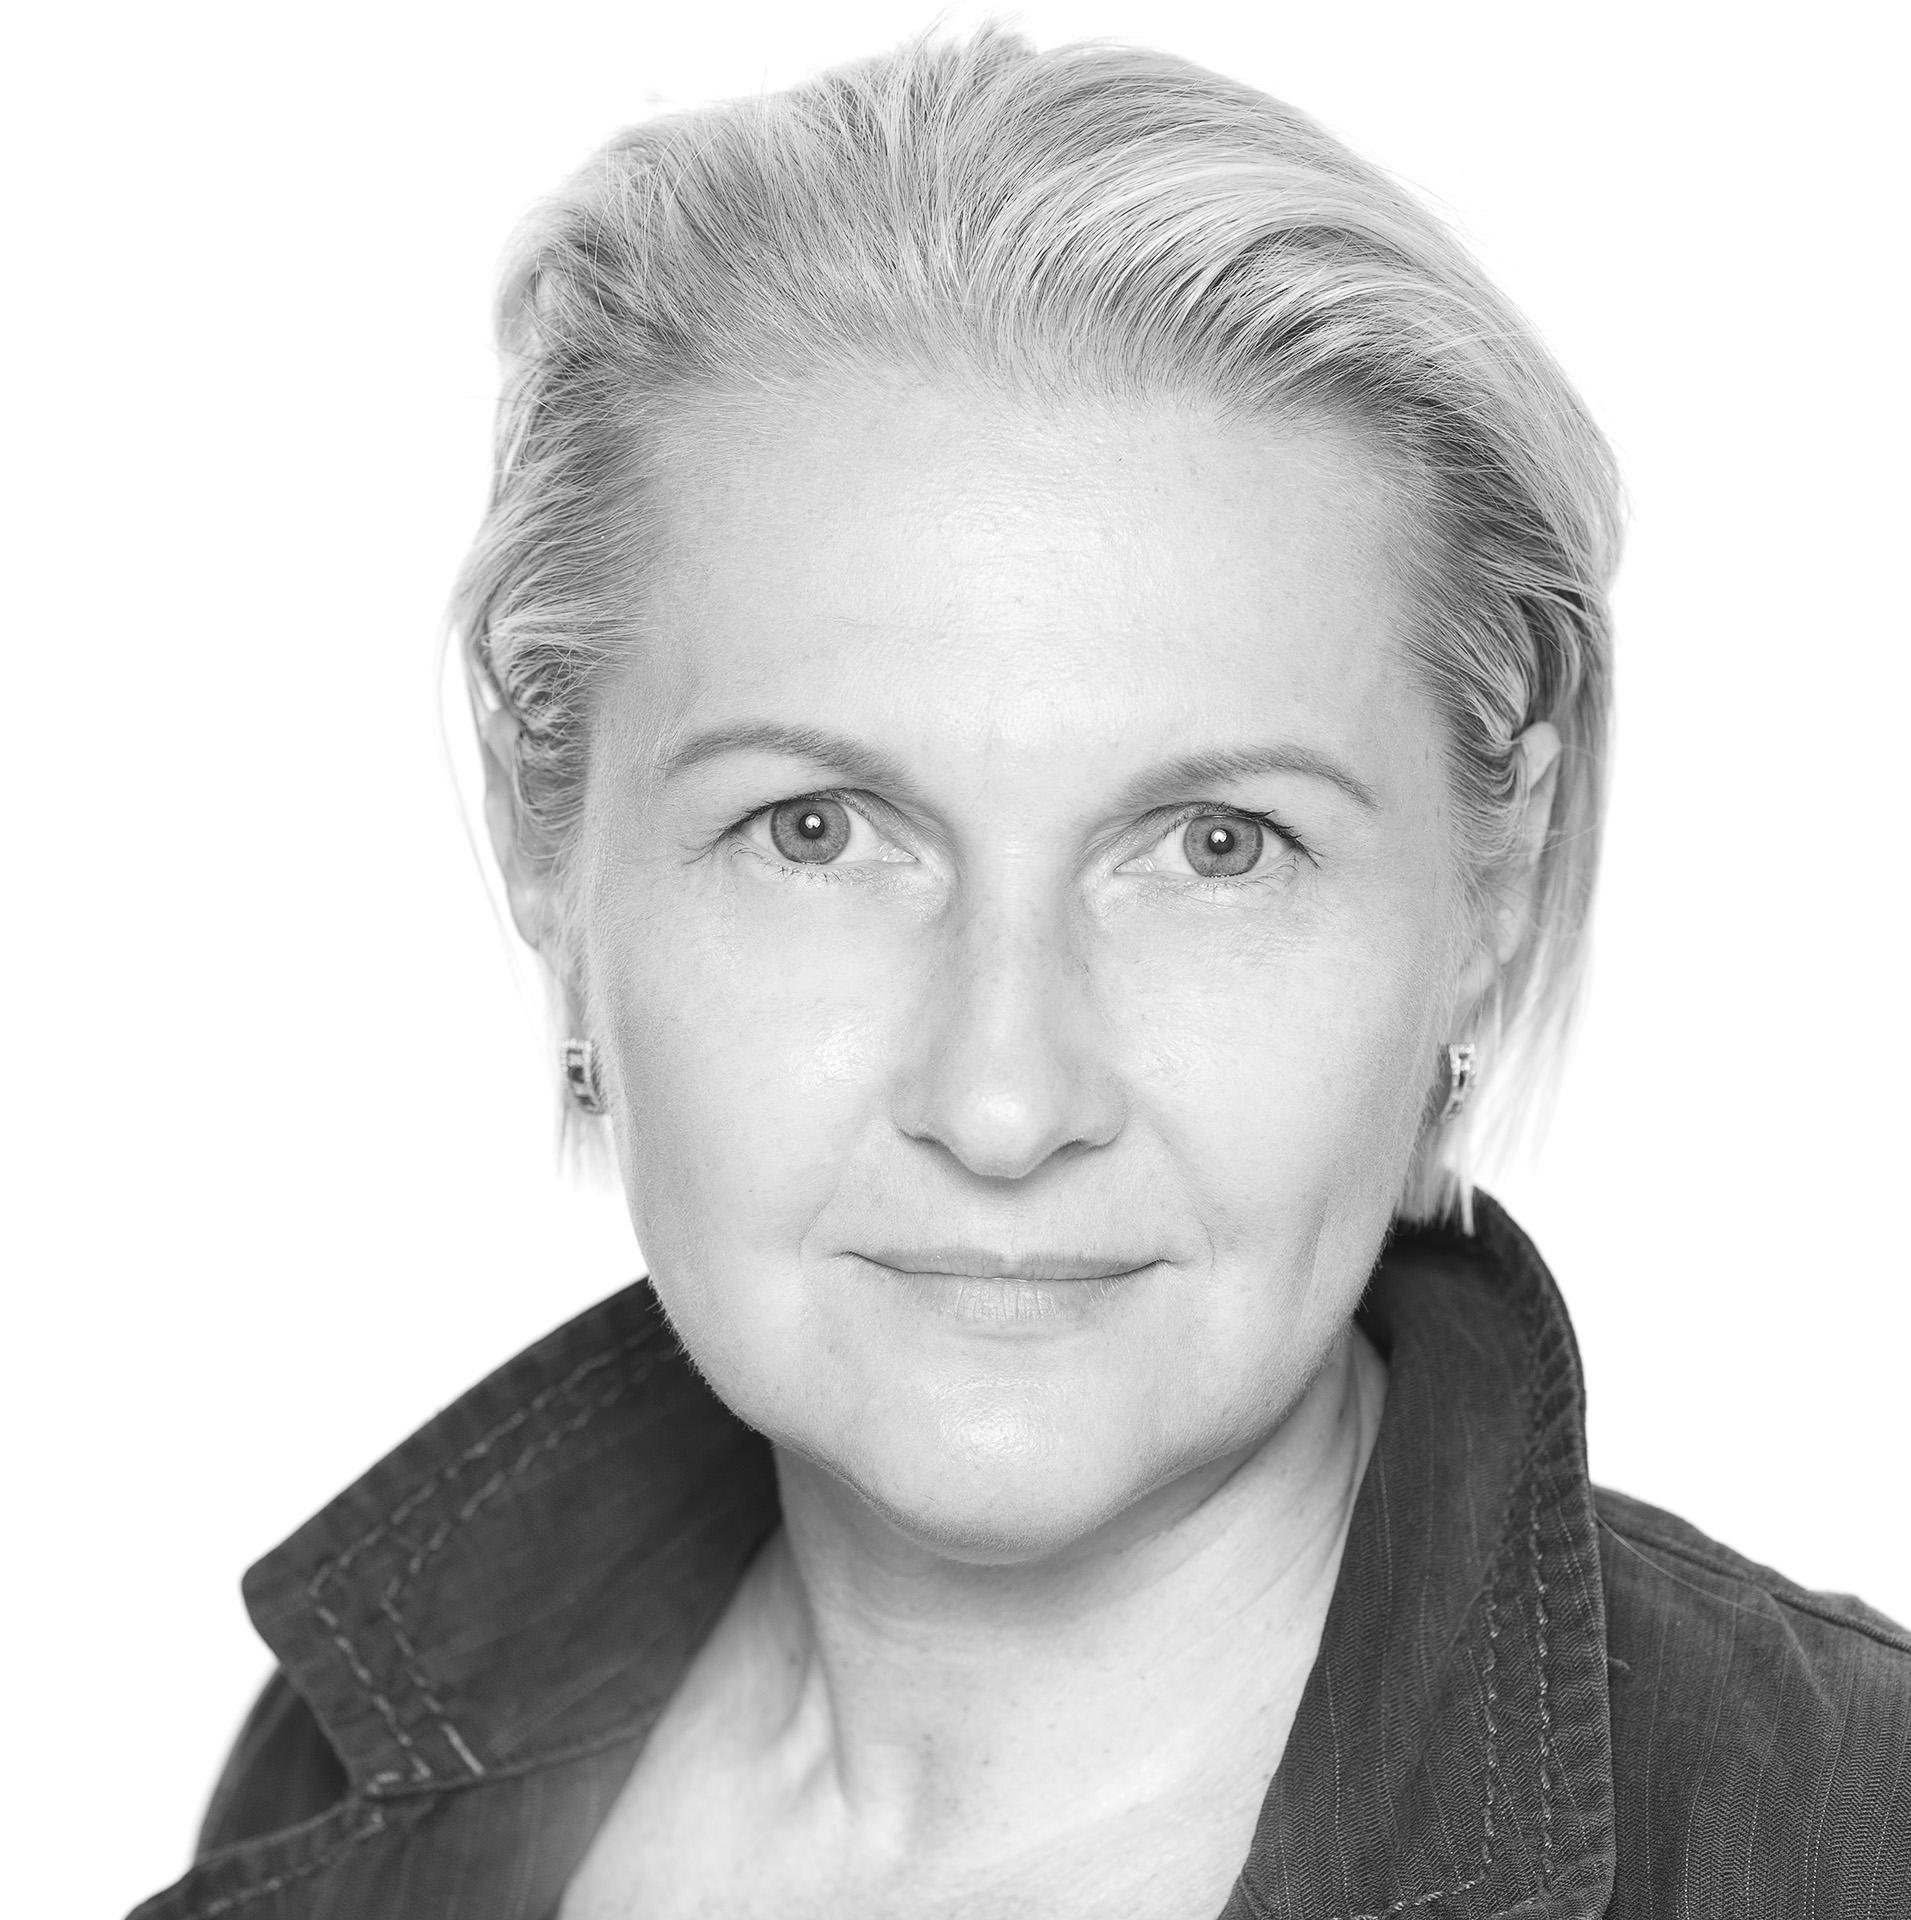 Nadja Gusenbauer - Photographer